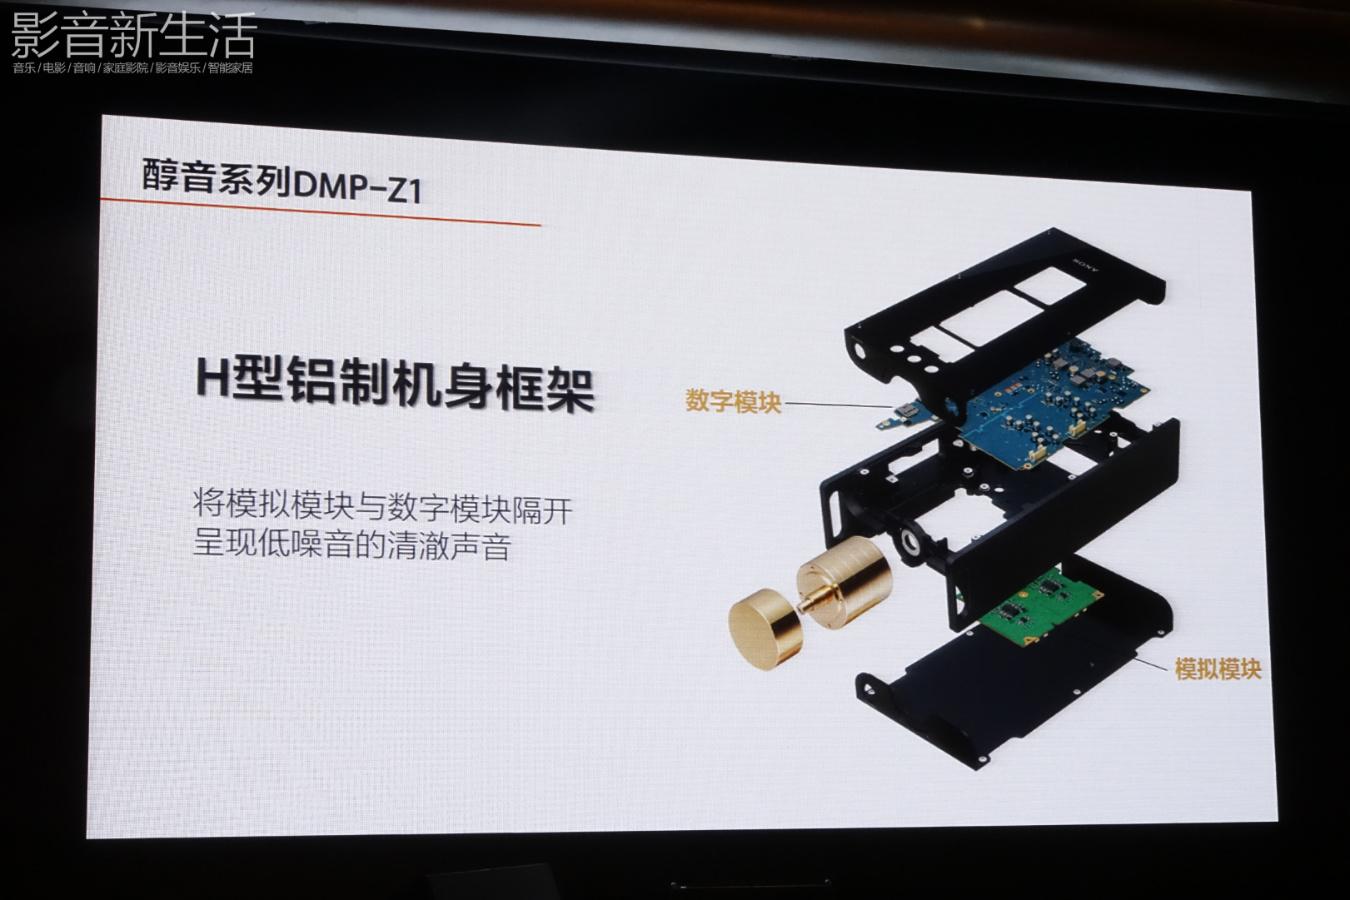 "Sony Hi Res 2018 13 - 新品 | ""重塑随身音乐娱乐王朝!"":Sony索尼发布Signature醇音系列新兄弟IER-Z1R和DMP-Z1,以及舞台监听耳机系列:IER-M7和IER-M9,还有升级款MDR-Z7M2!"